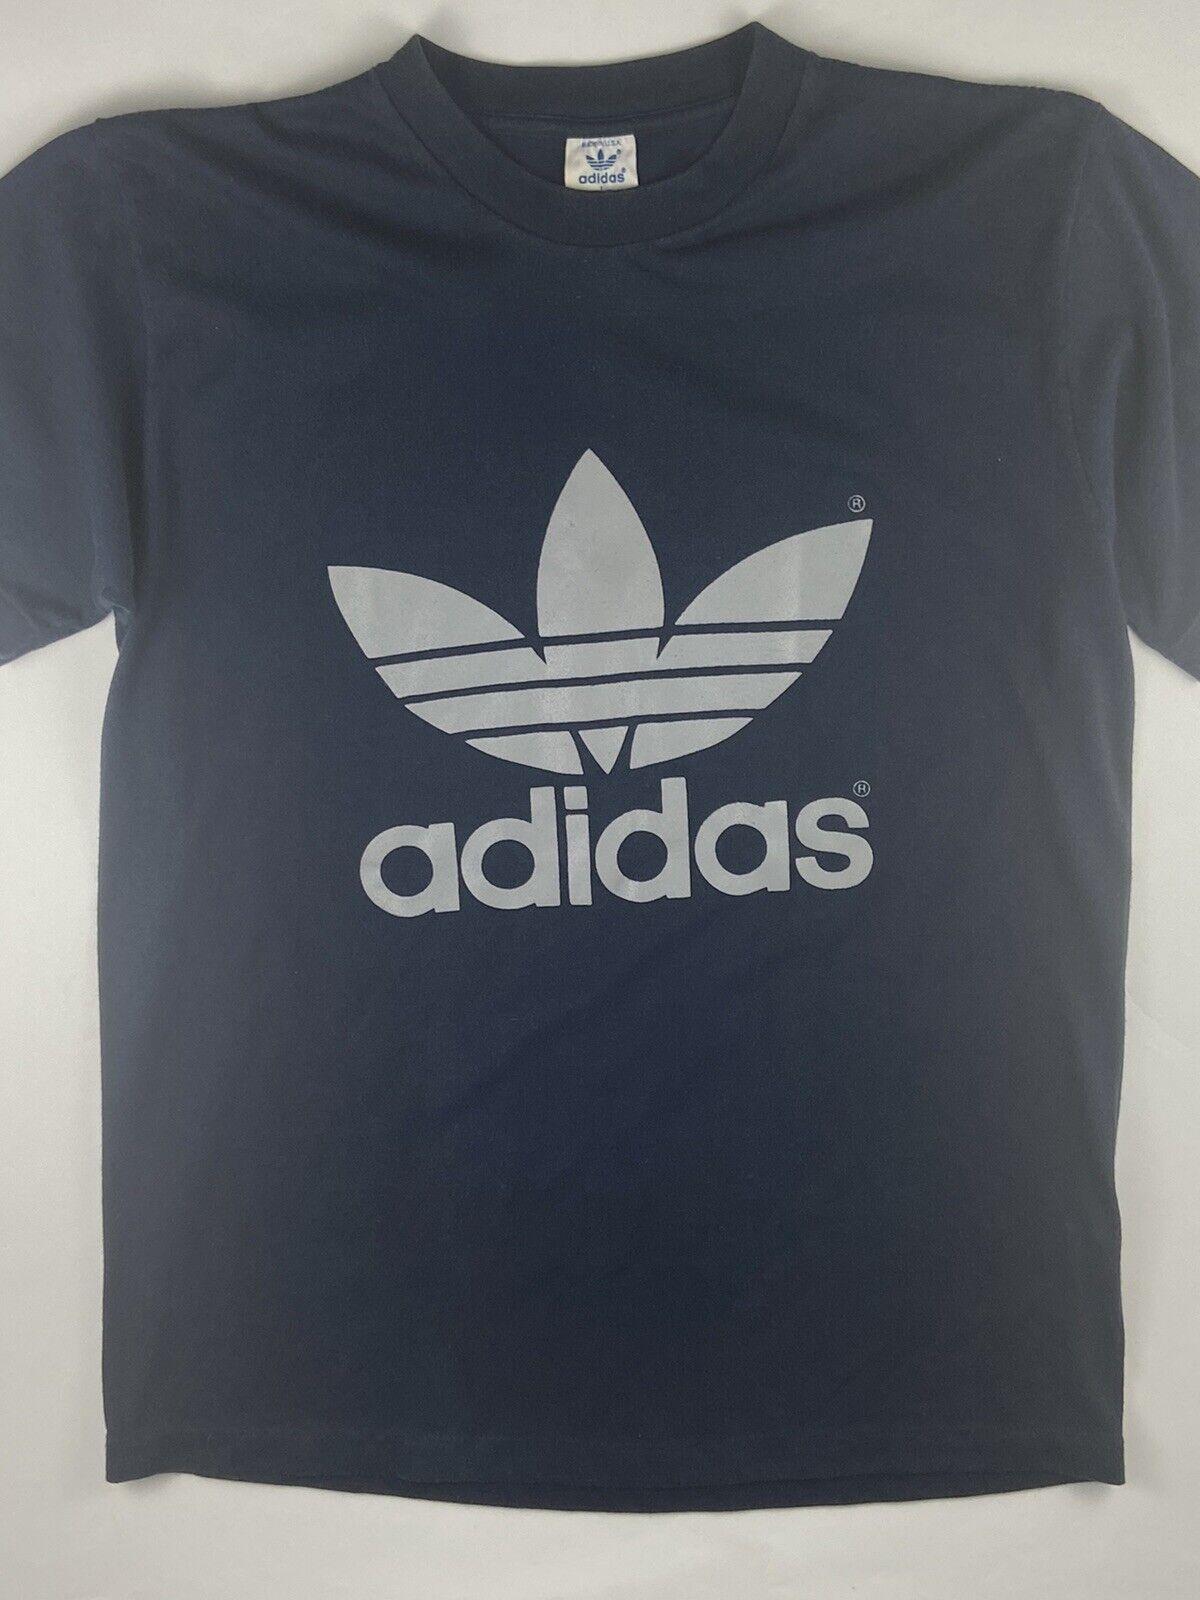 VTG ADIDAS 2 Sided Single Stitch Trefoil Logo Blue Grey T Shirt 1980s Med Large